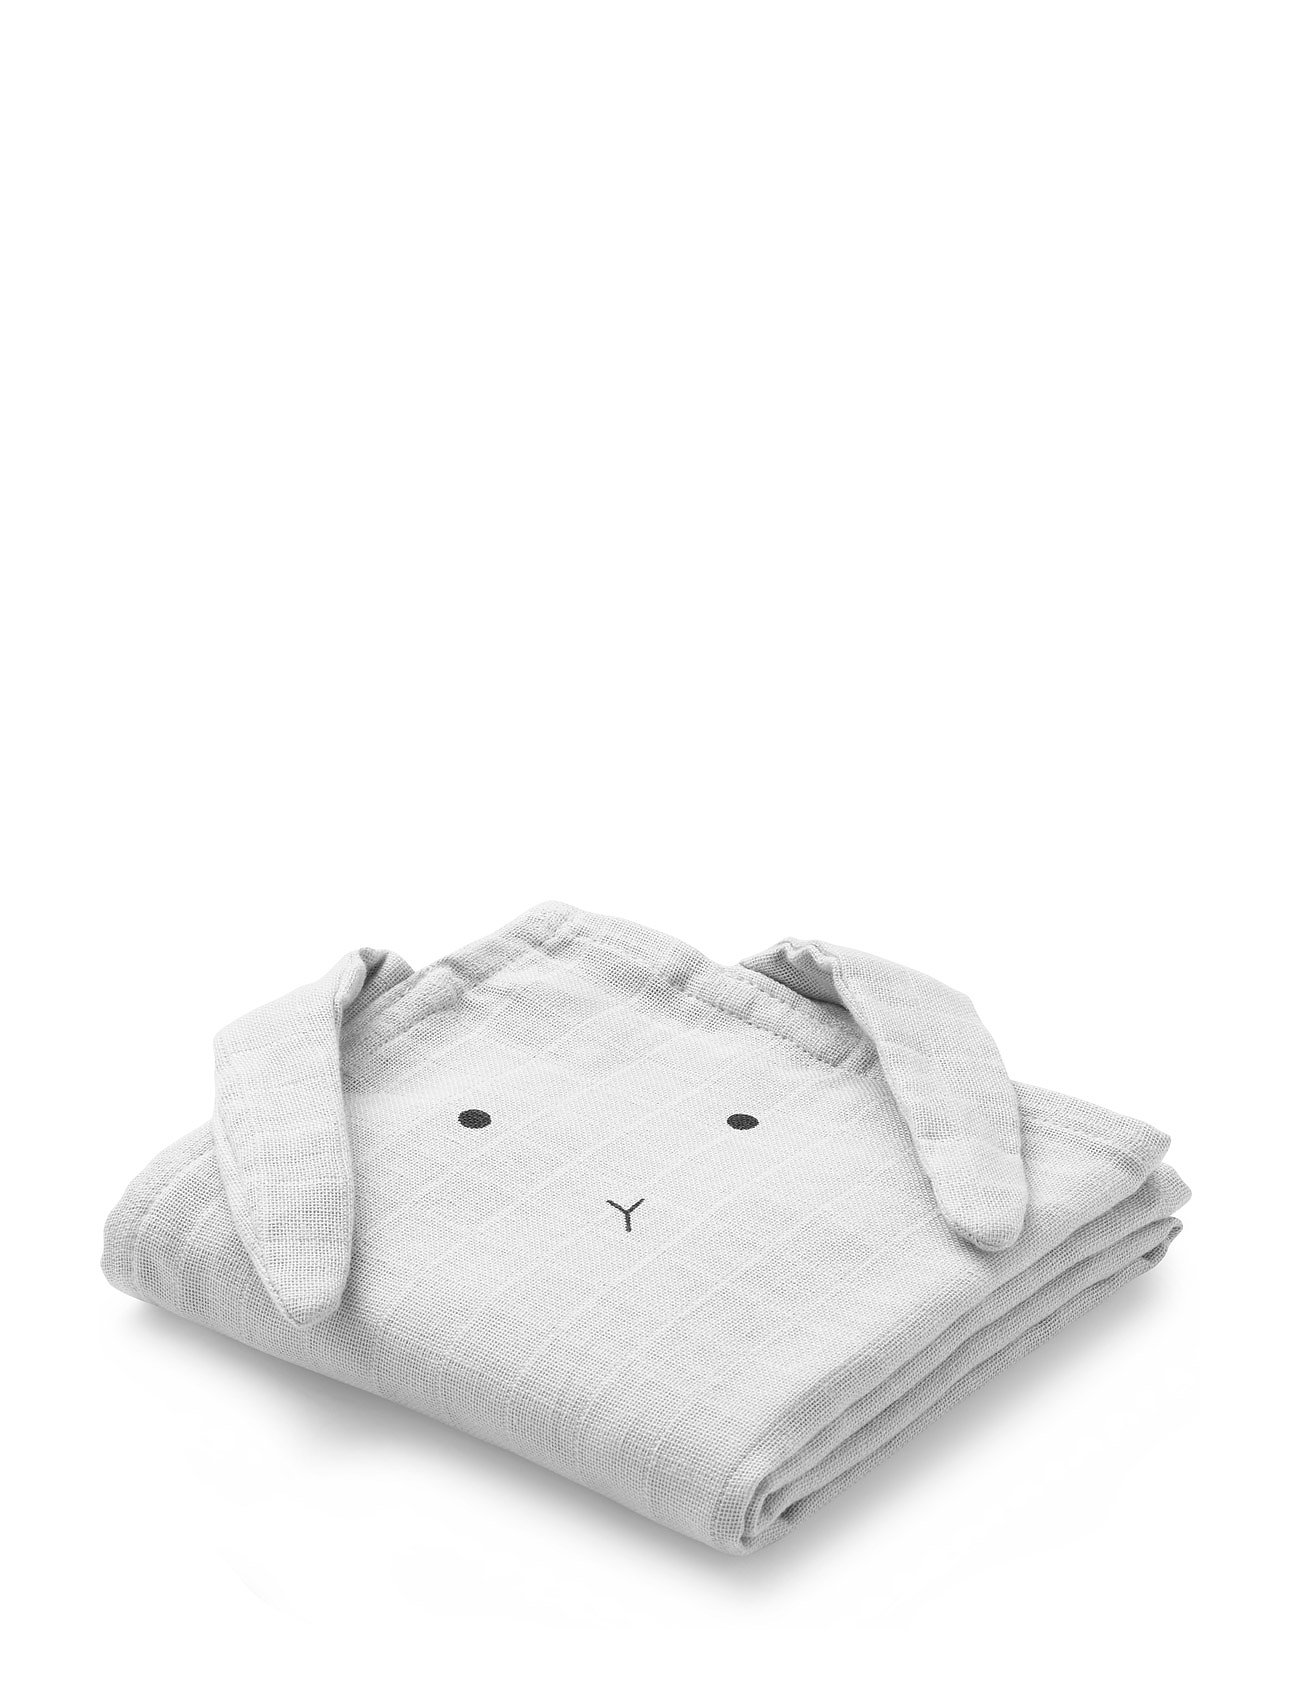 Image of Hannah Muslin Cloth Rabbit 2 Pack Vaskeklud Grå LIEWOOD (3029722147)